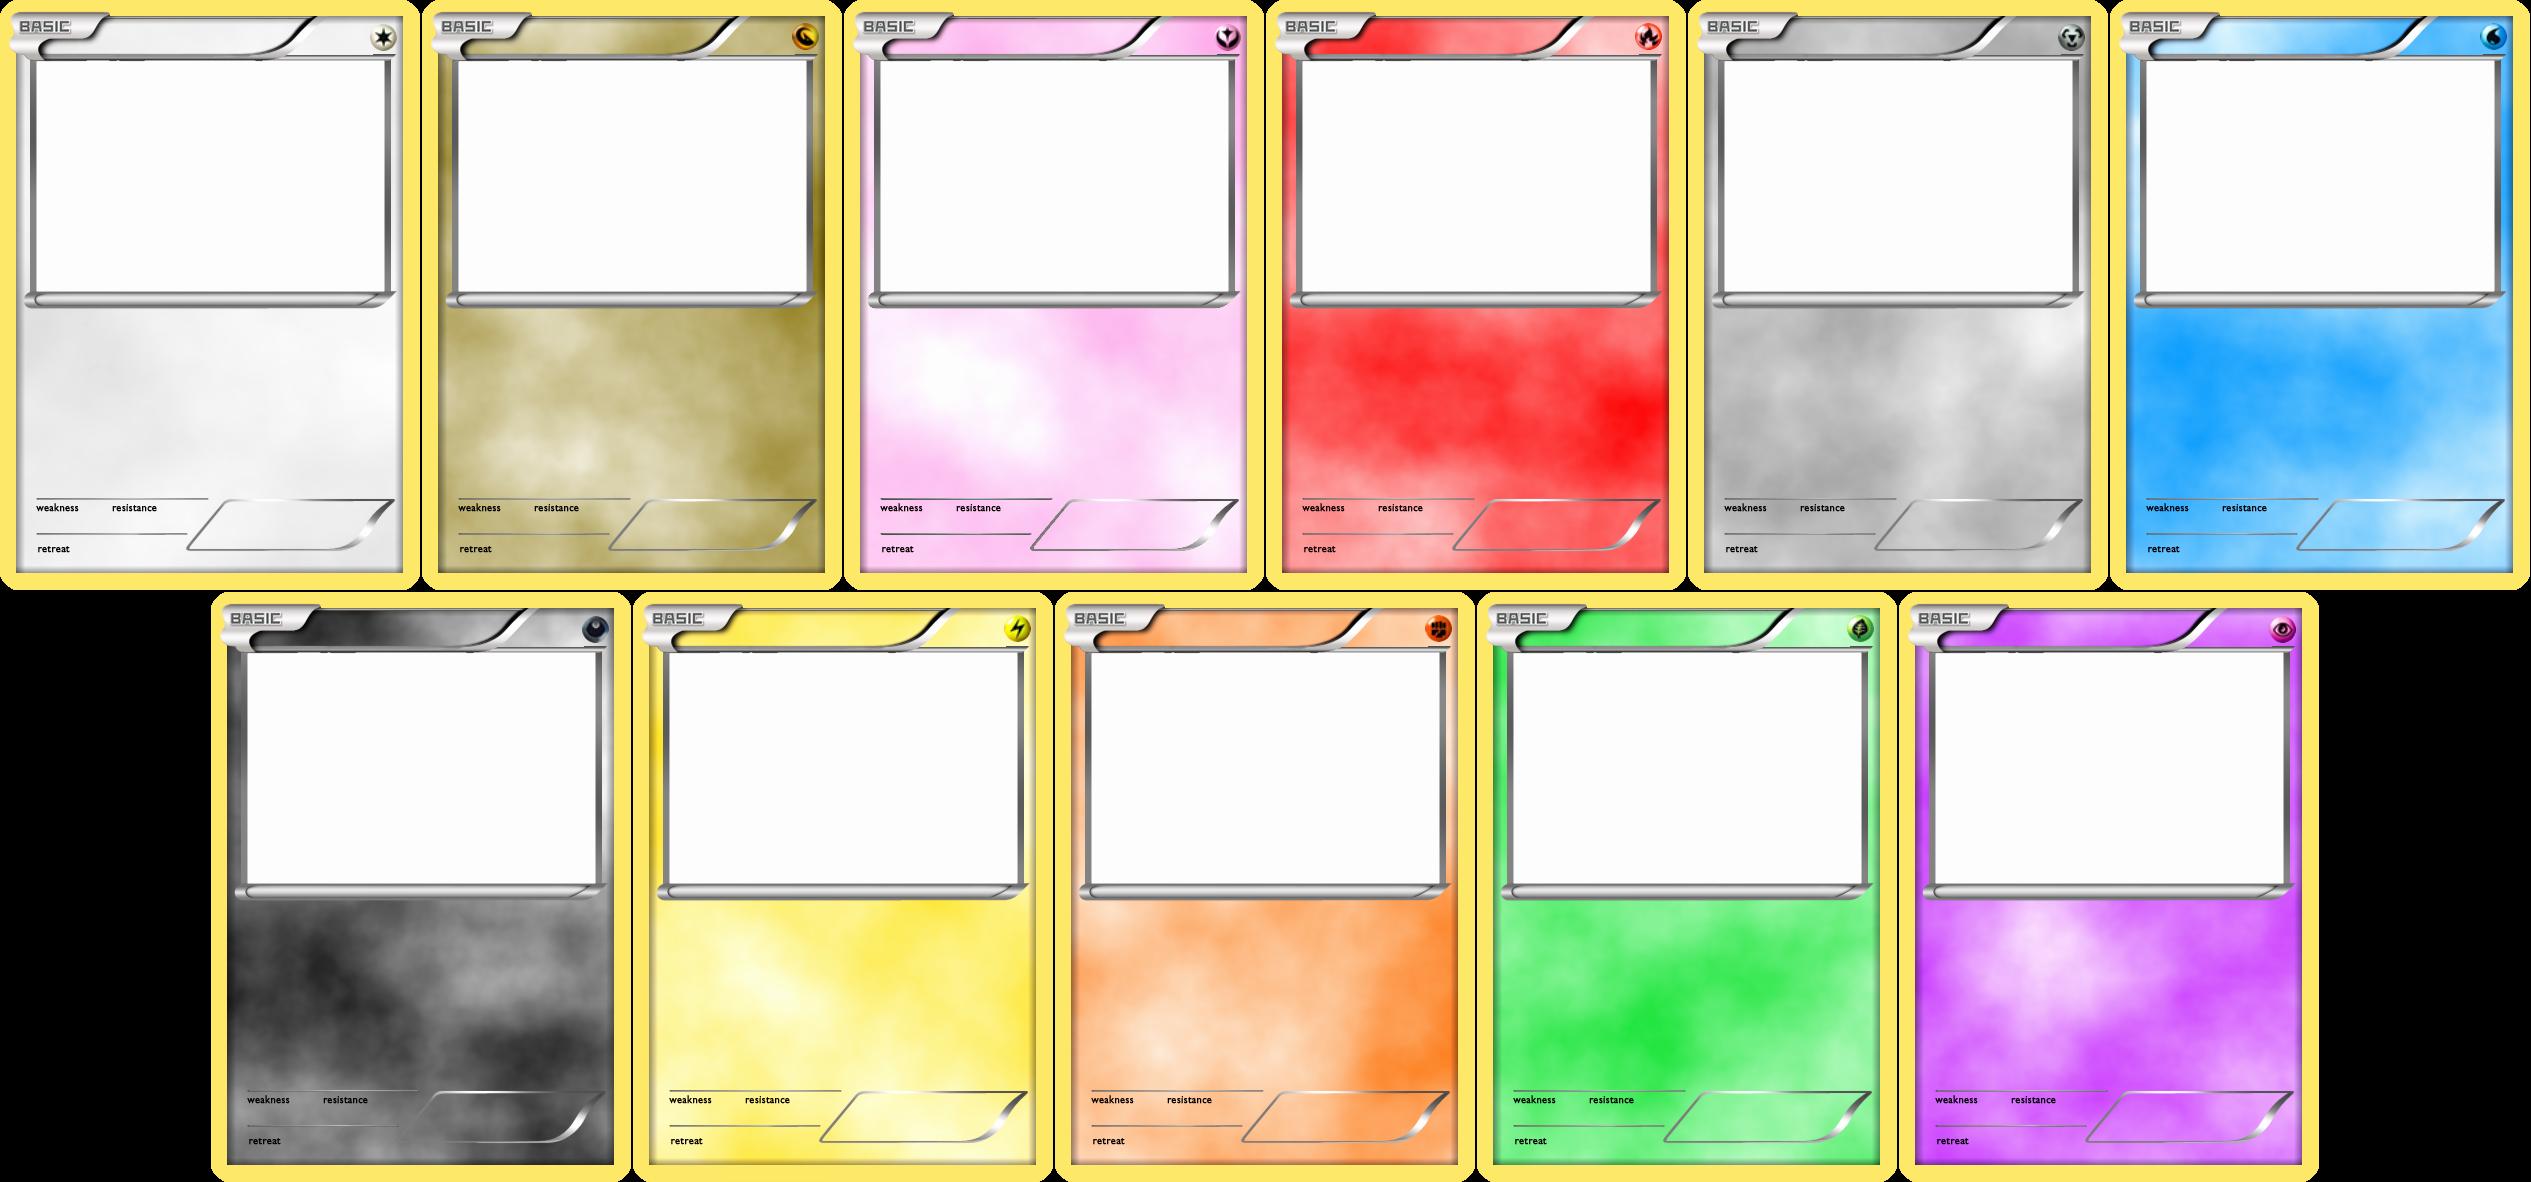 Blank Trading Card Template Luxury Pokemon Blank Card Templates by Levelinfinitum On Deviantart